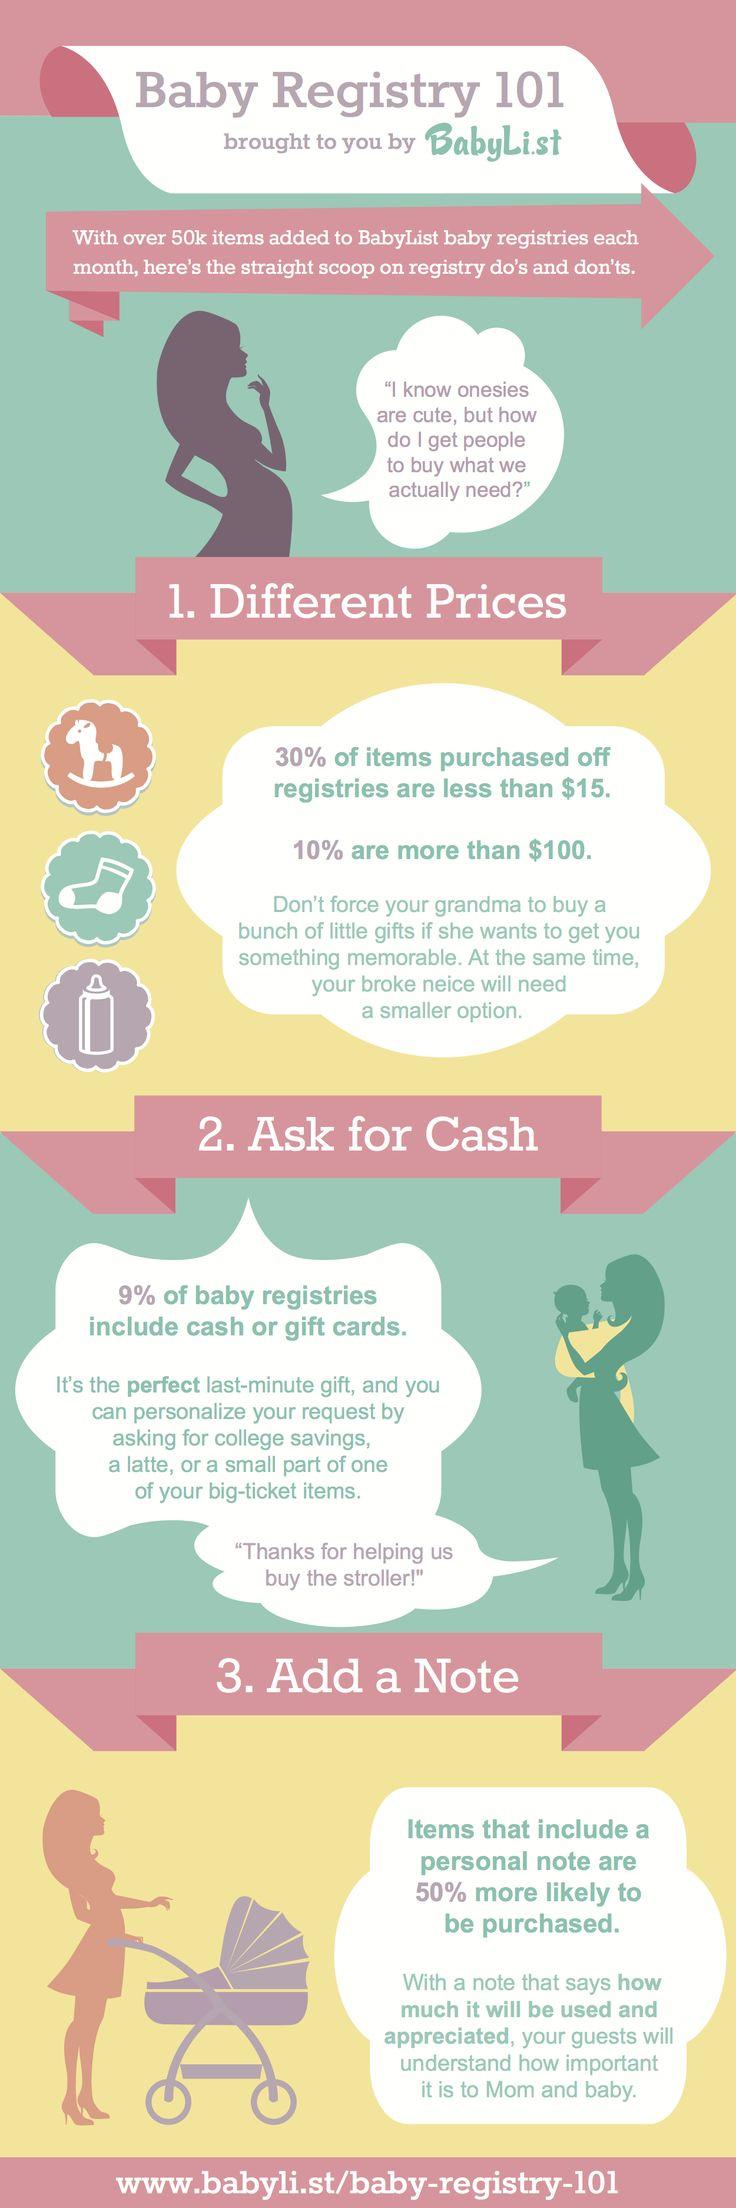 baby shower registry baby registry checklist shower baby baby shower